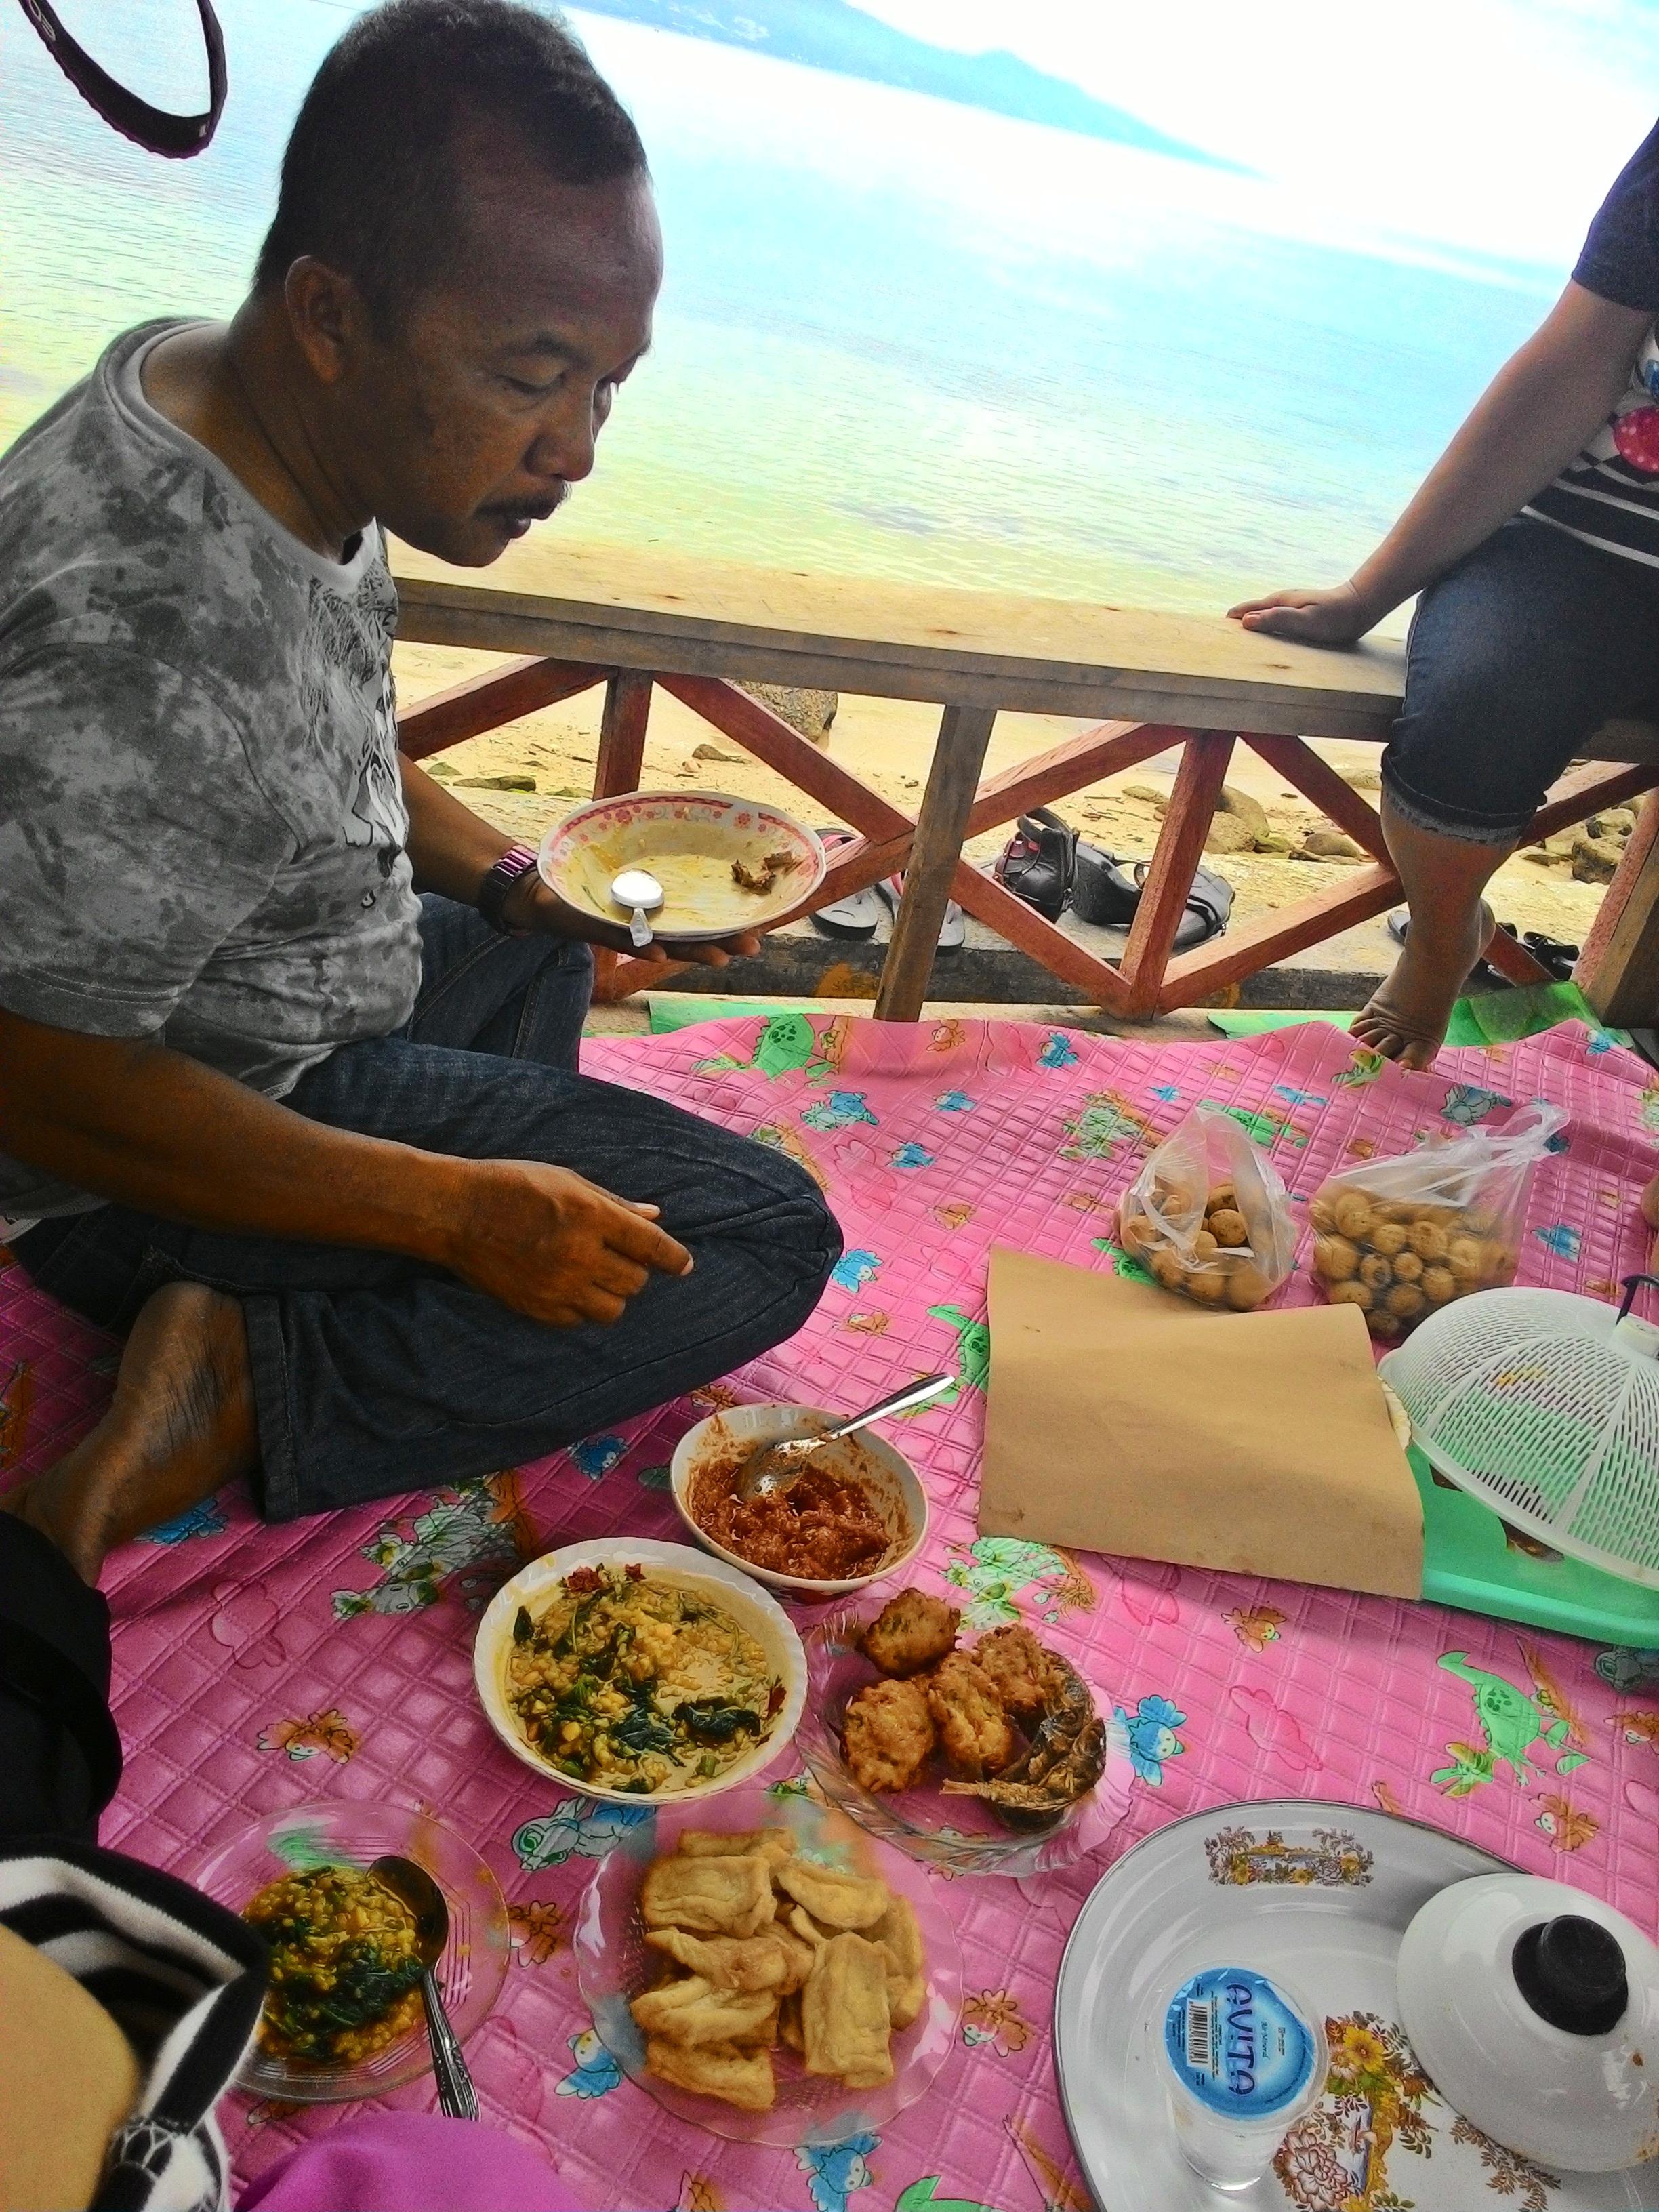 Kota Palu Maman Mimin Menikmati Bubur Ubi Manado Pisang Goreng